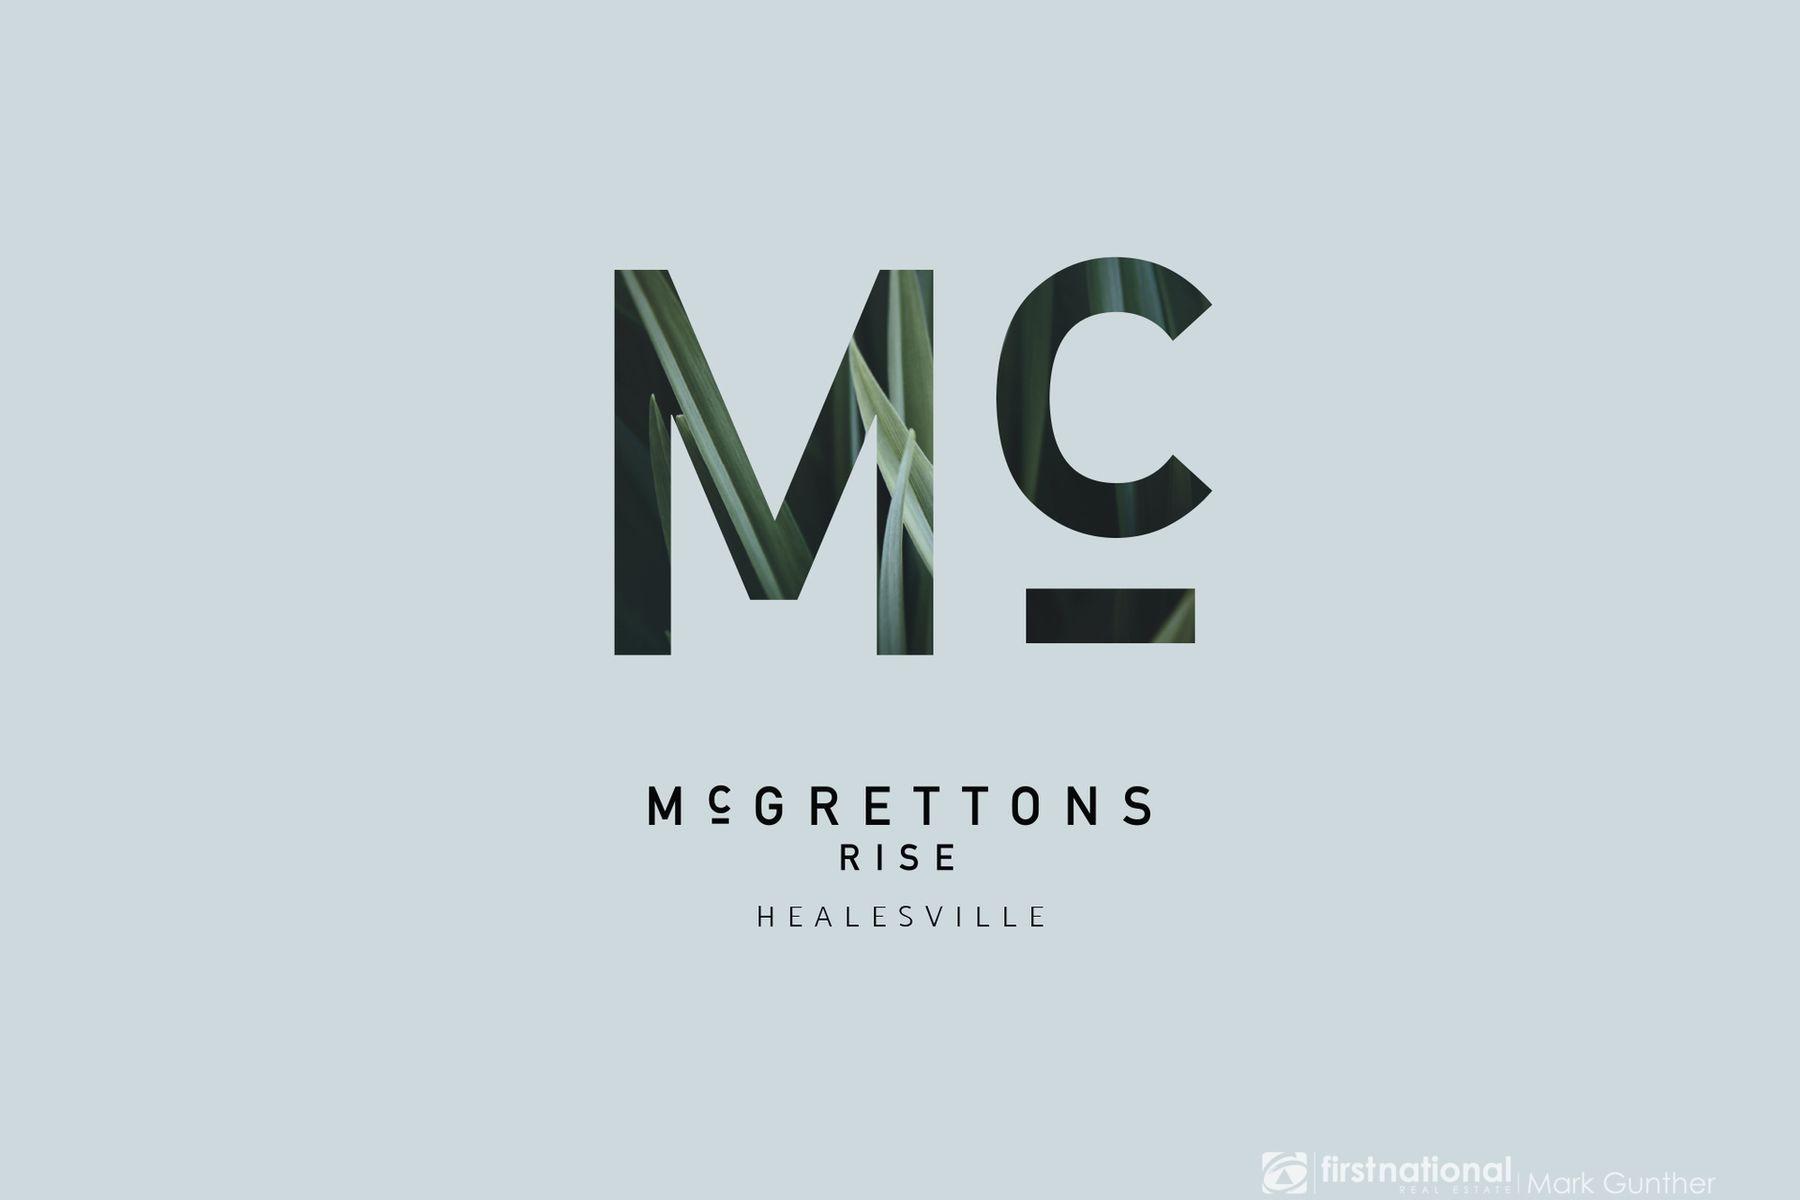 Lot 4/29 Mcgrettons Road, Healesville, VIC 3777